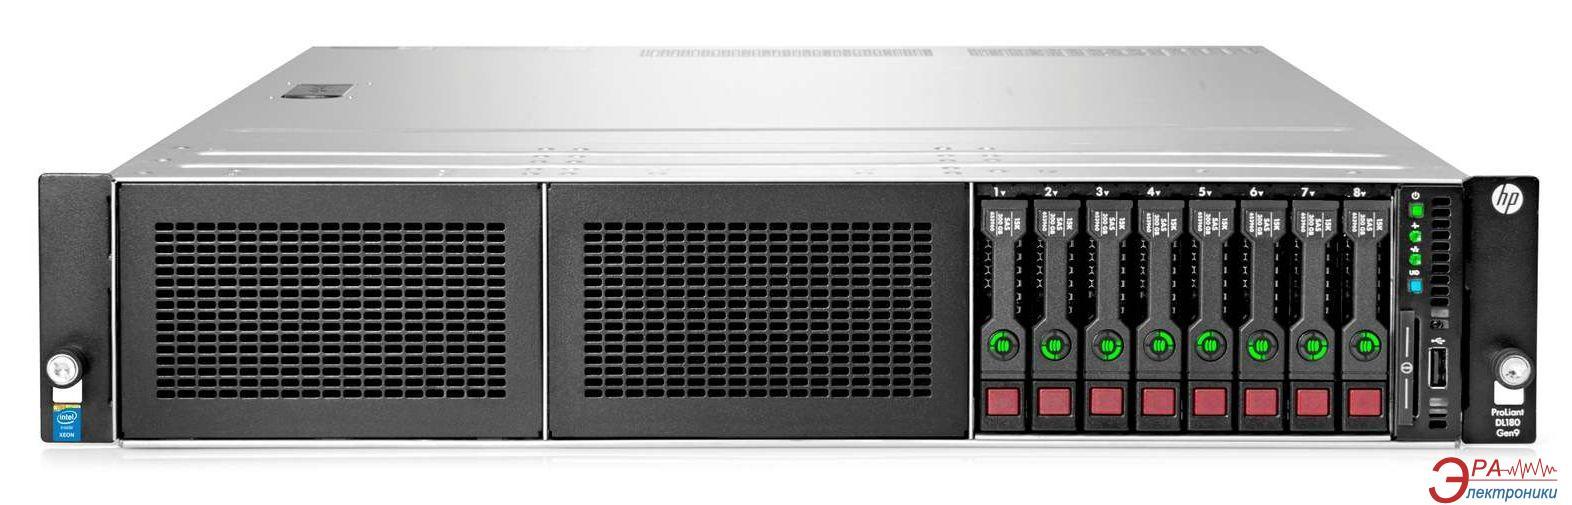 Сервер HP DL180 Gen9 (784108-425)